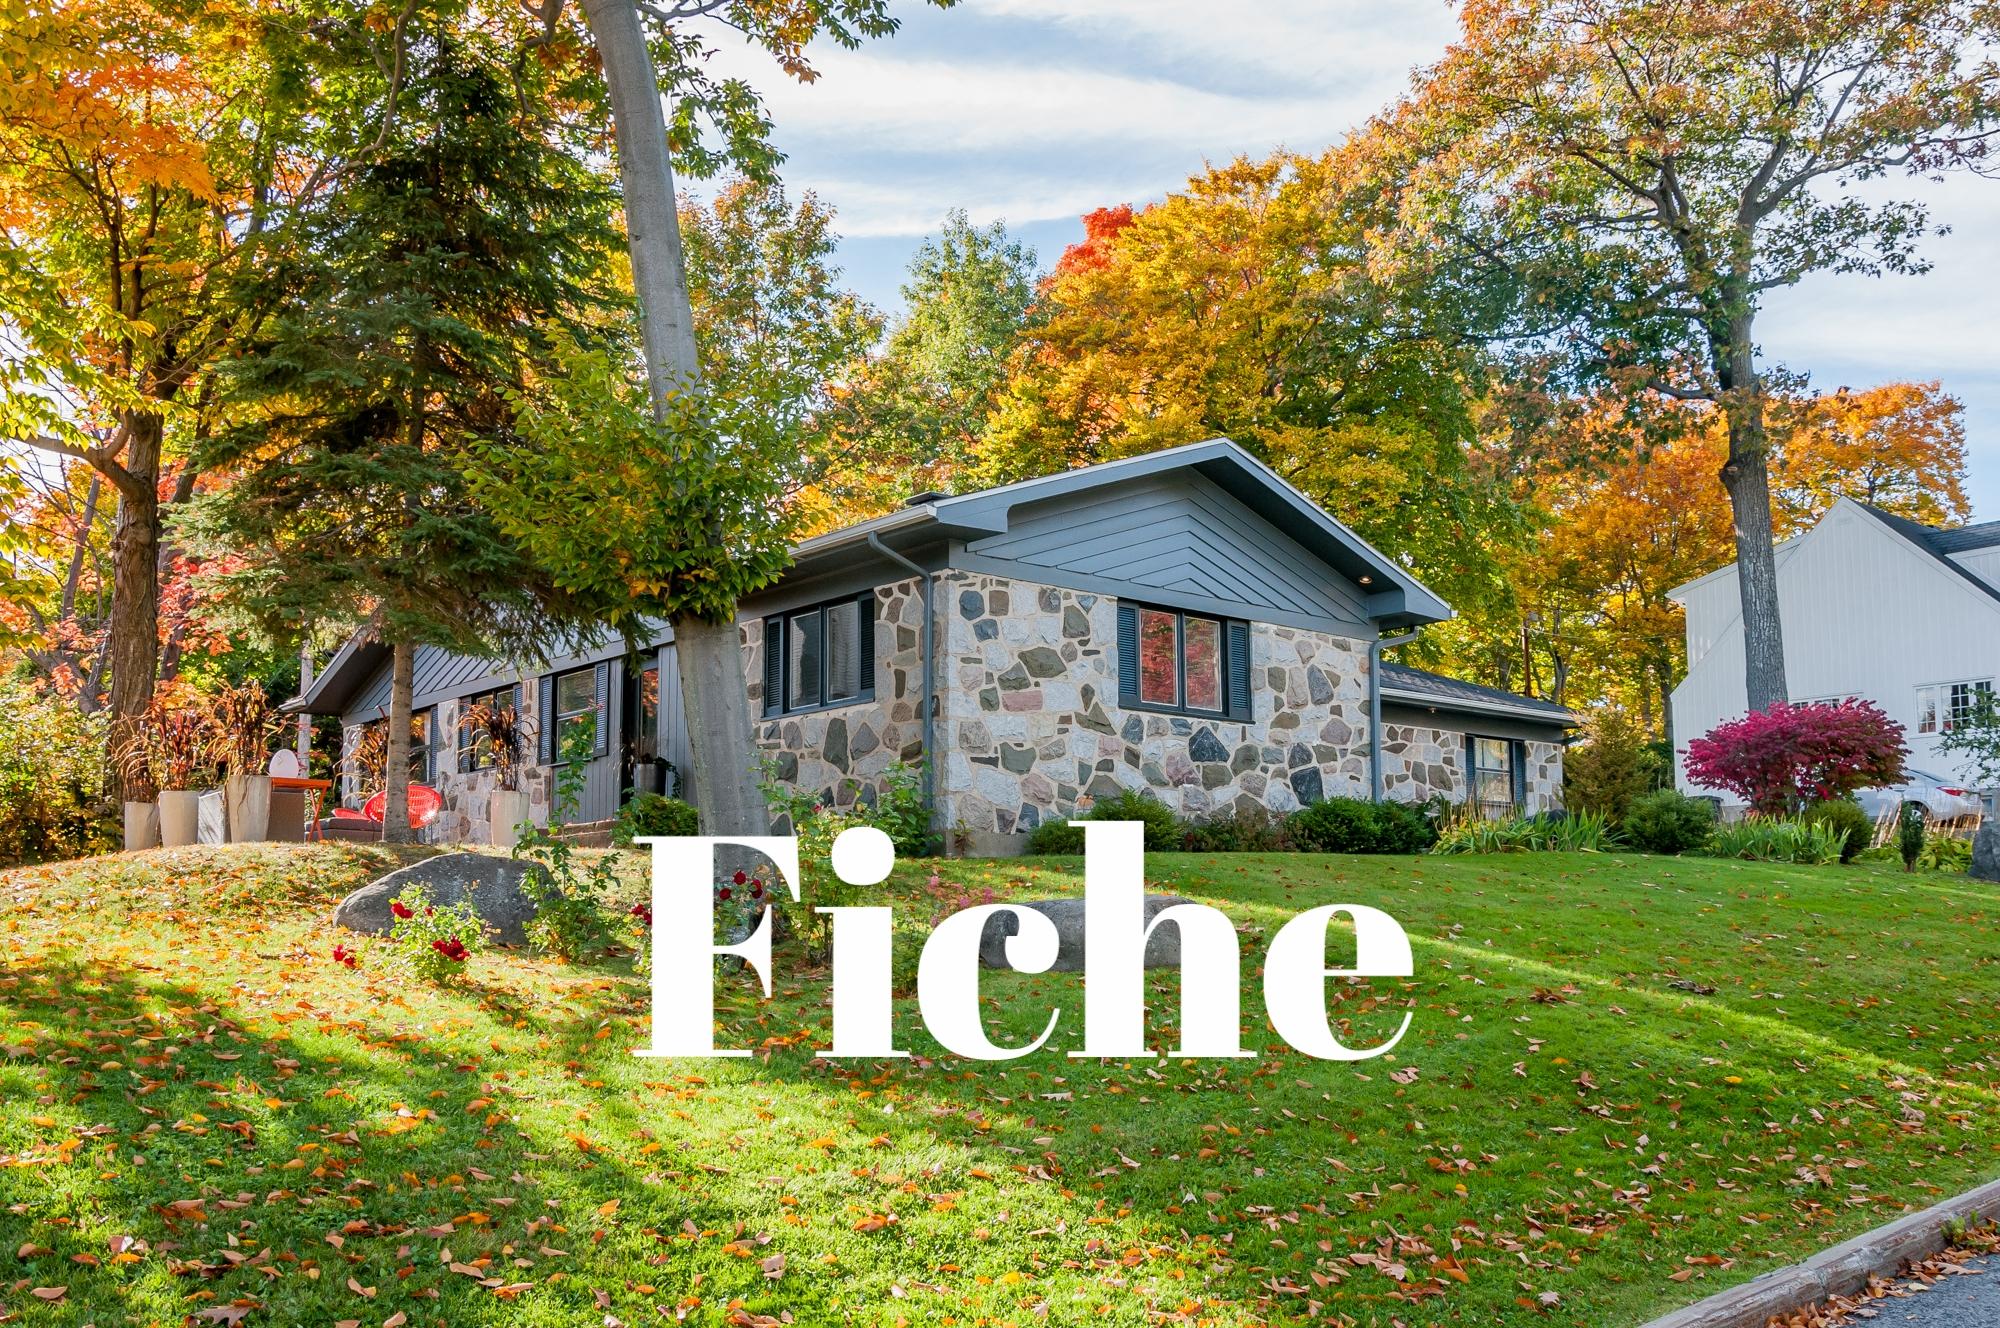 Maison-a-vendre-3018-rue-de-la-promenade-quebec-DAVID-FAFARD (2).jpg